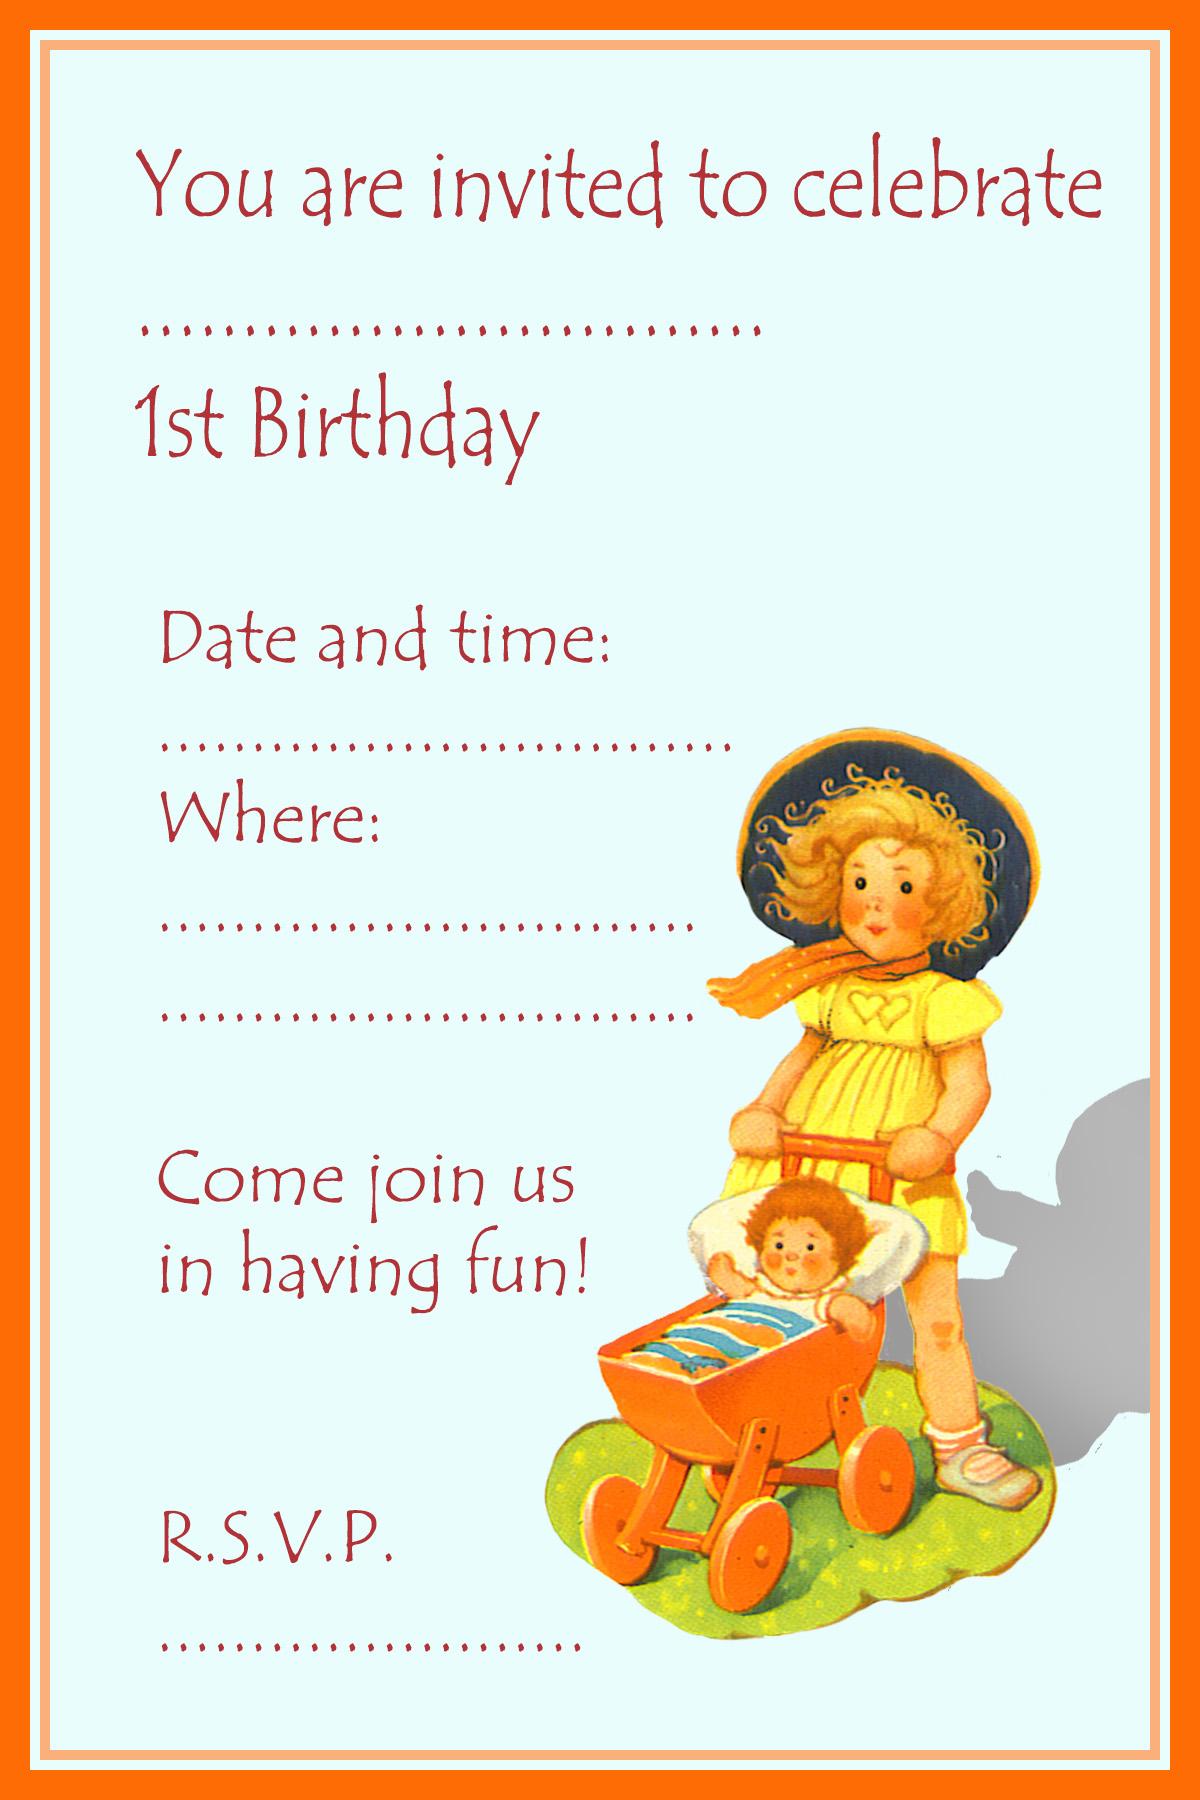 birthday invitations girl 1 year old